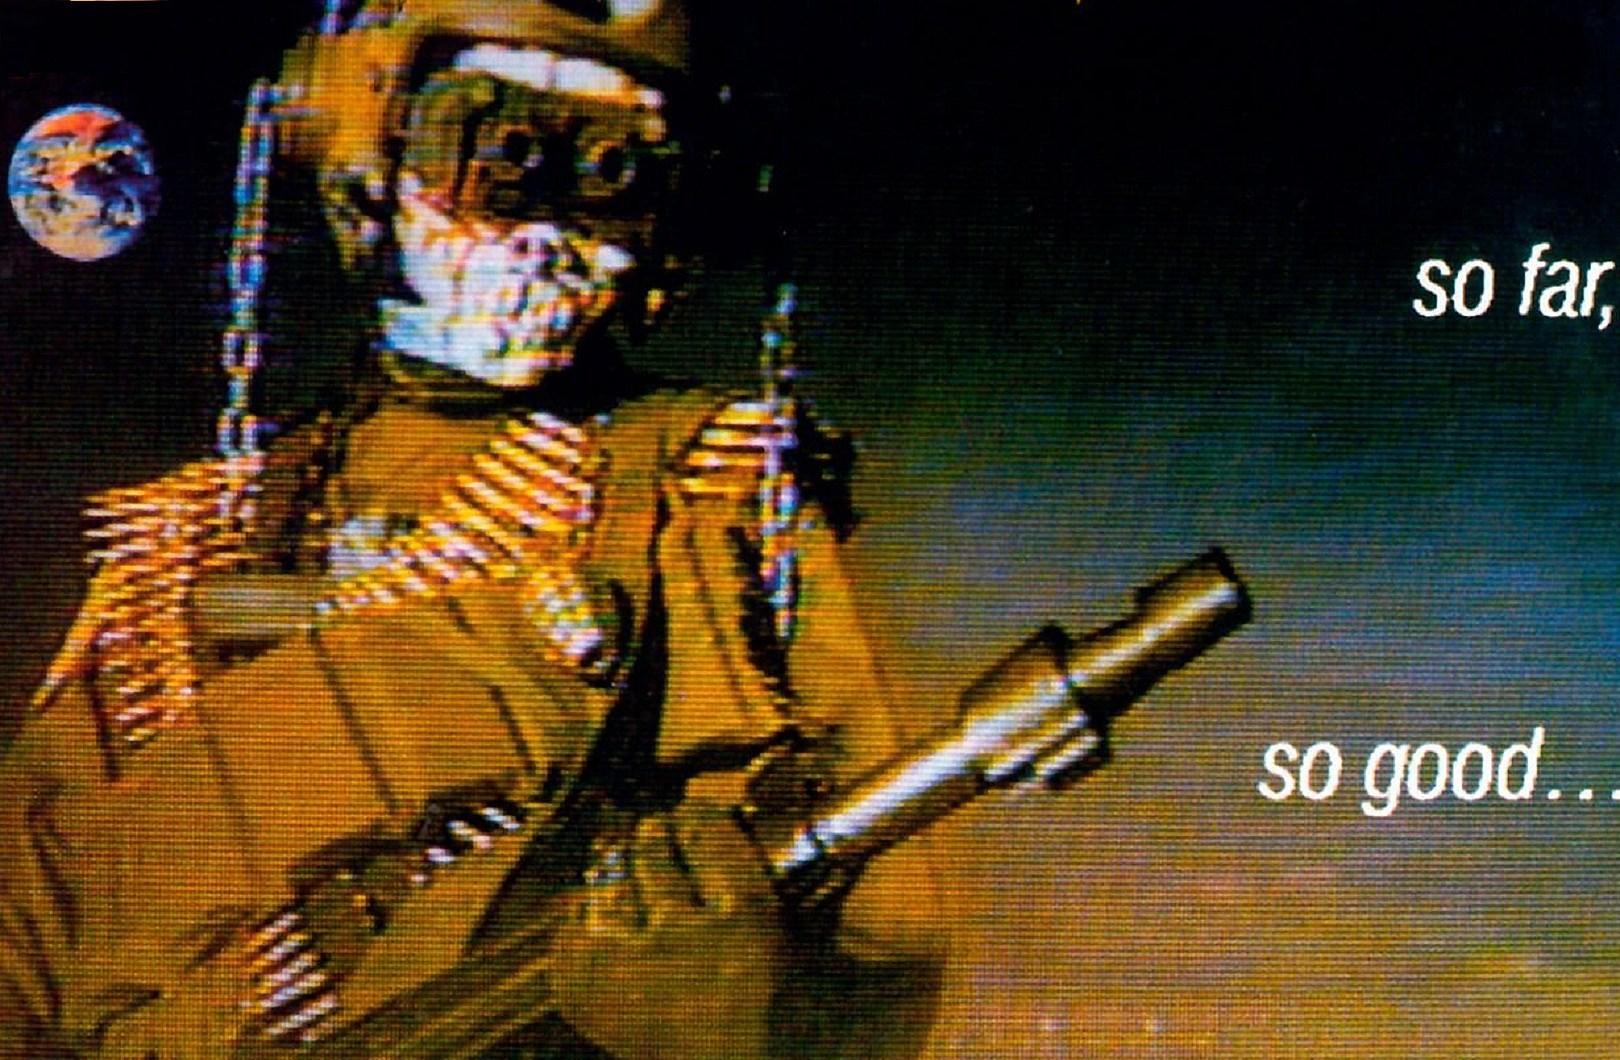 30 Years Ago Megadeth Release So Far So Good So What